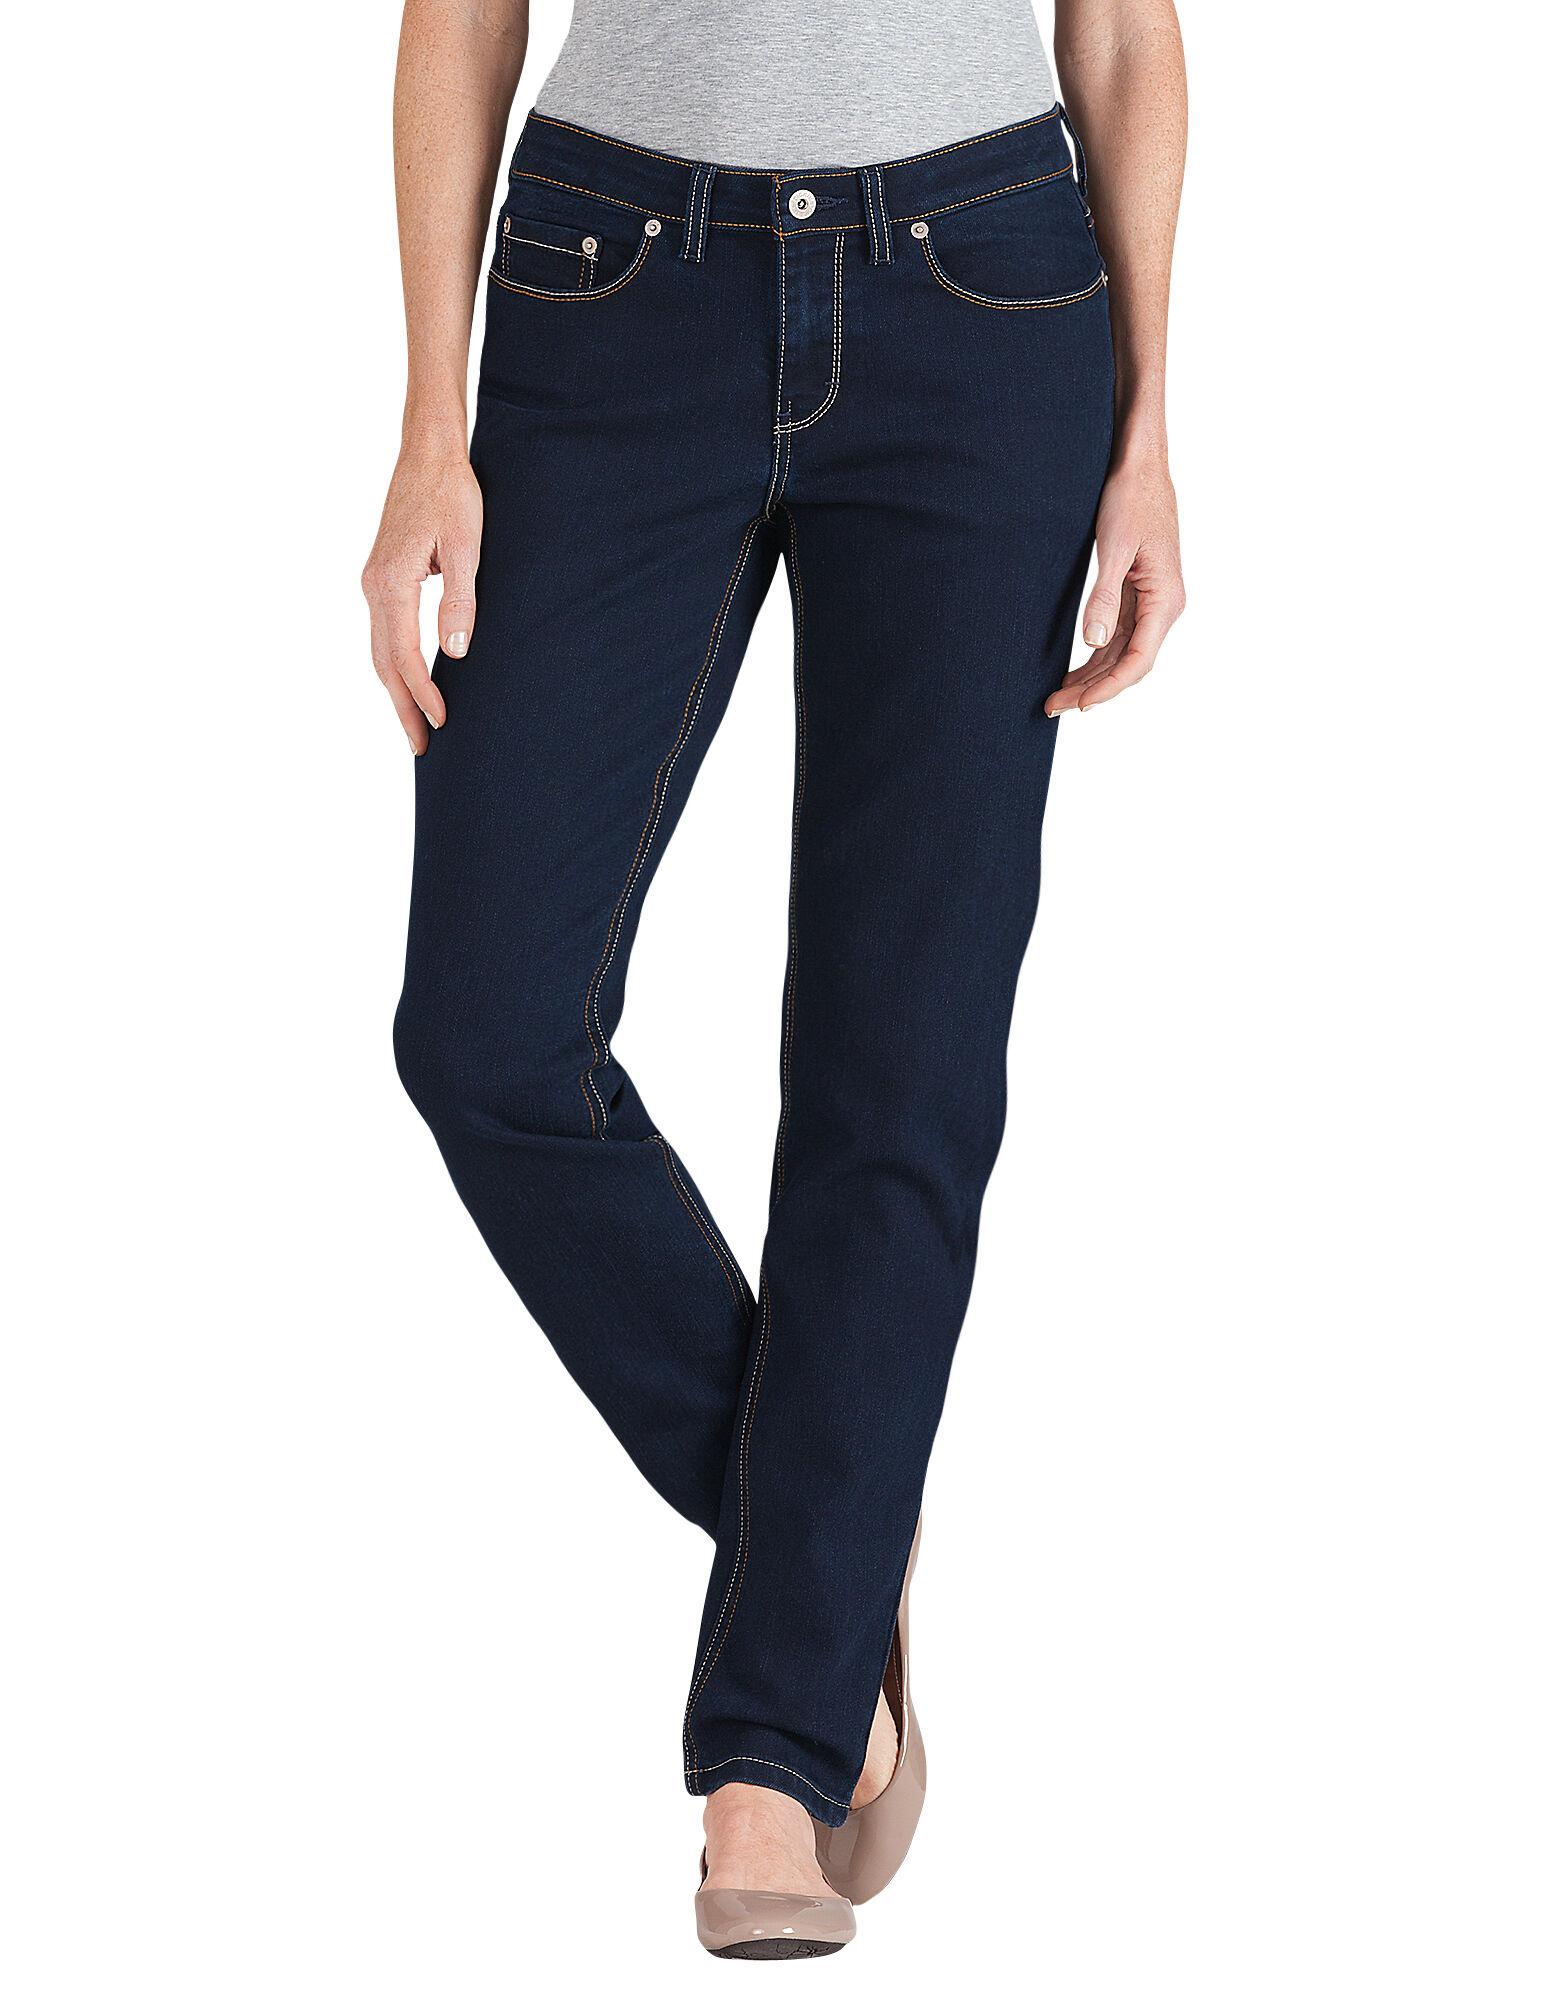 Women's Curvy Fit Skinny Leg Denim Jean